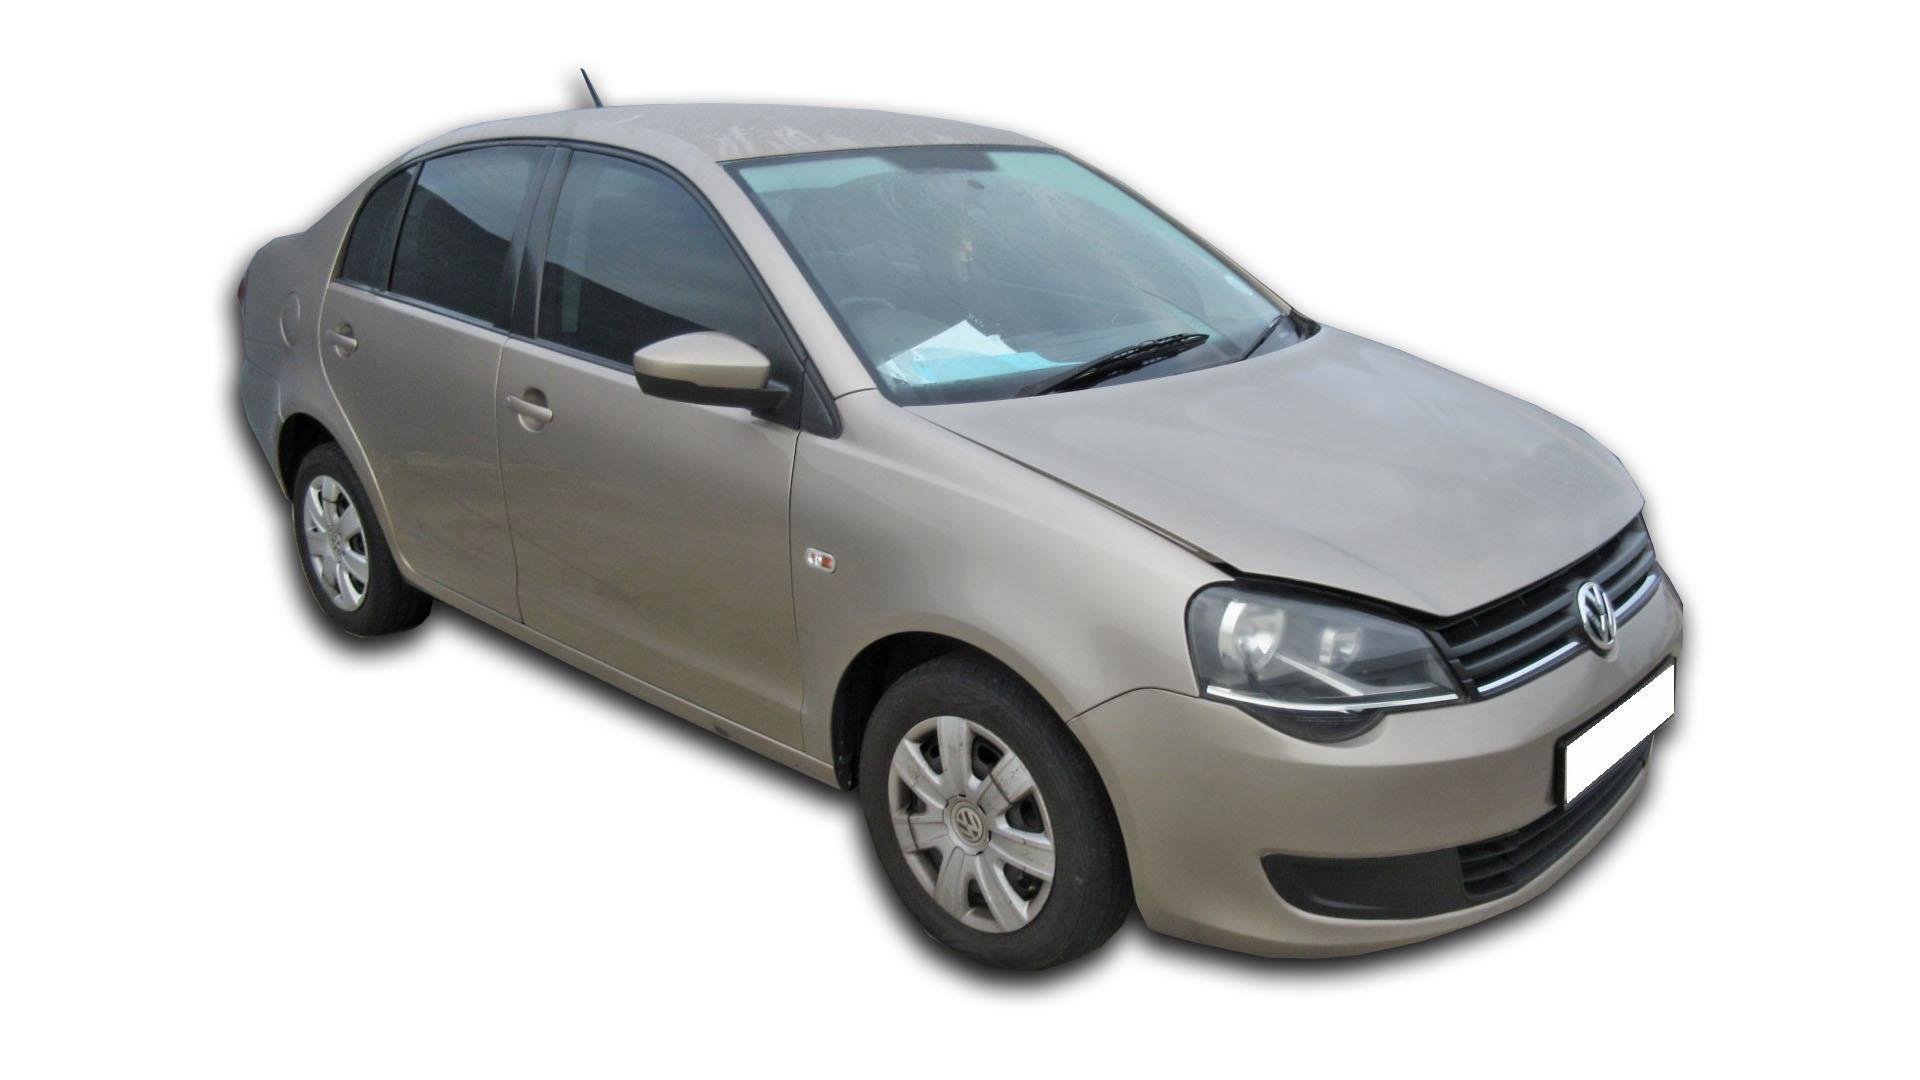 VW Polo Vivo GP 1.4 Trend